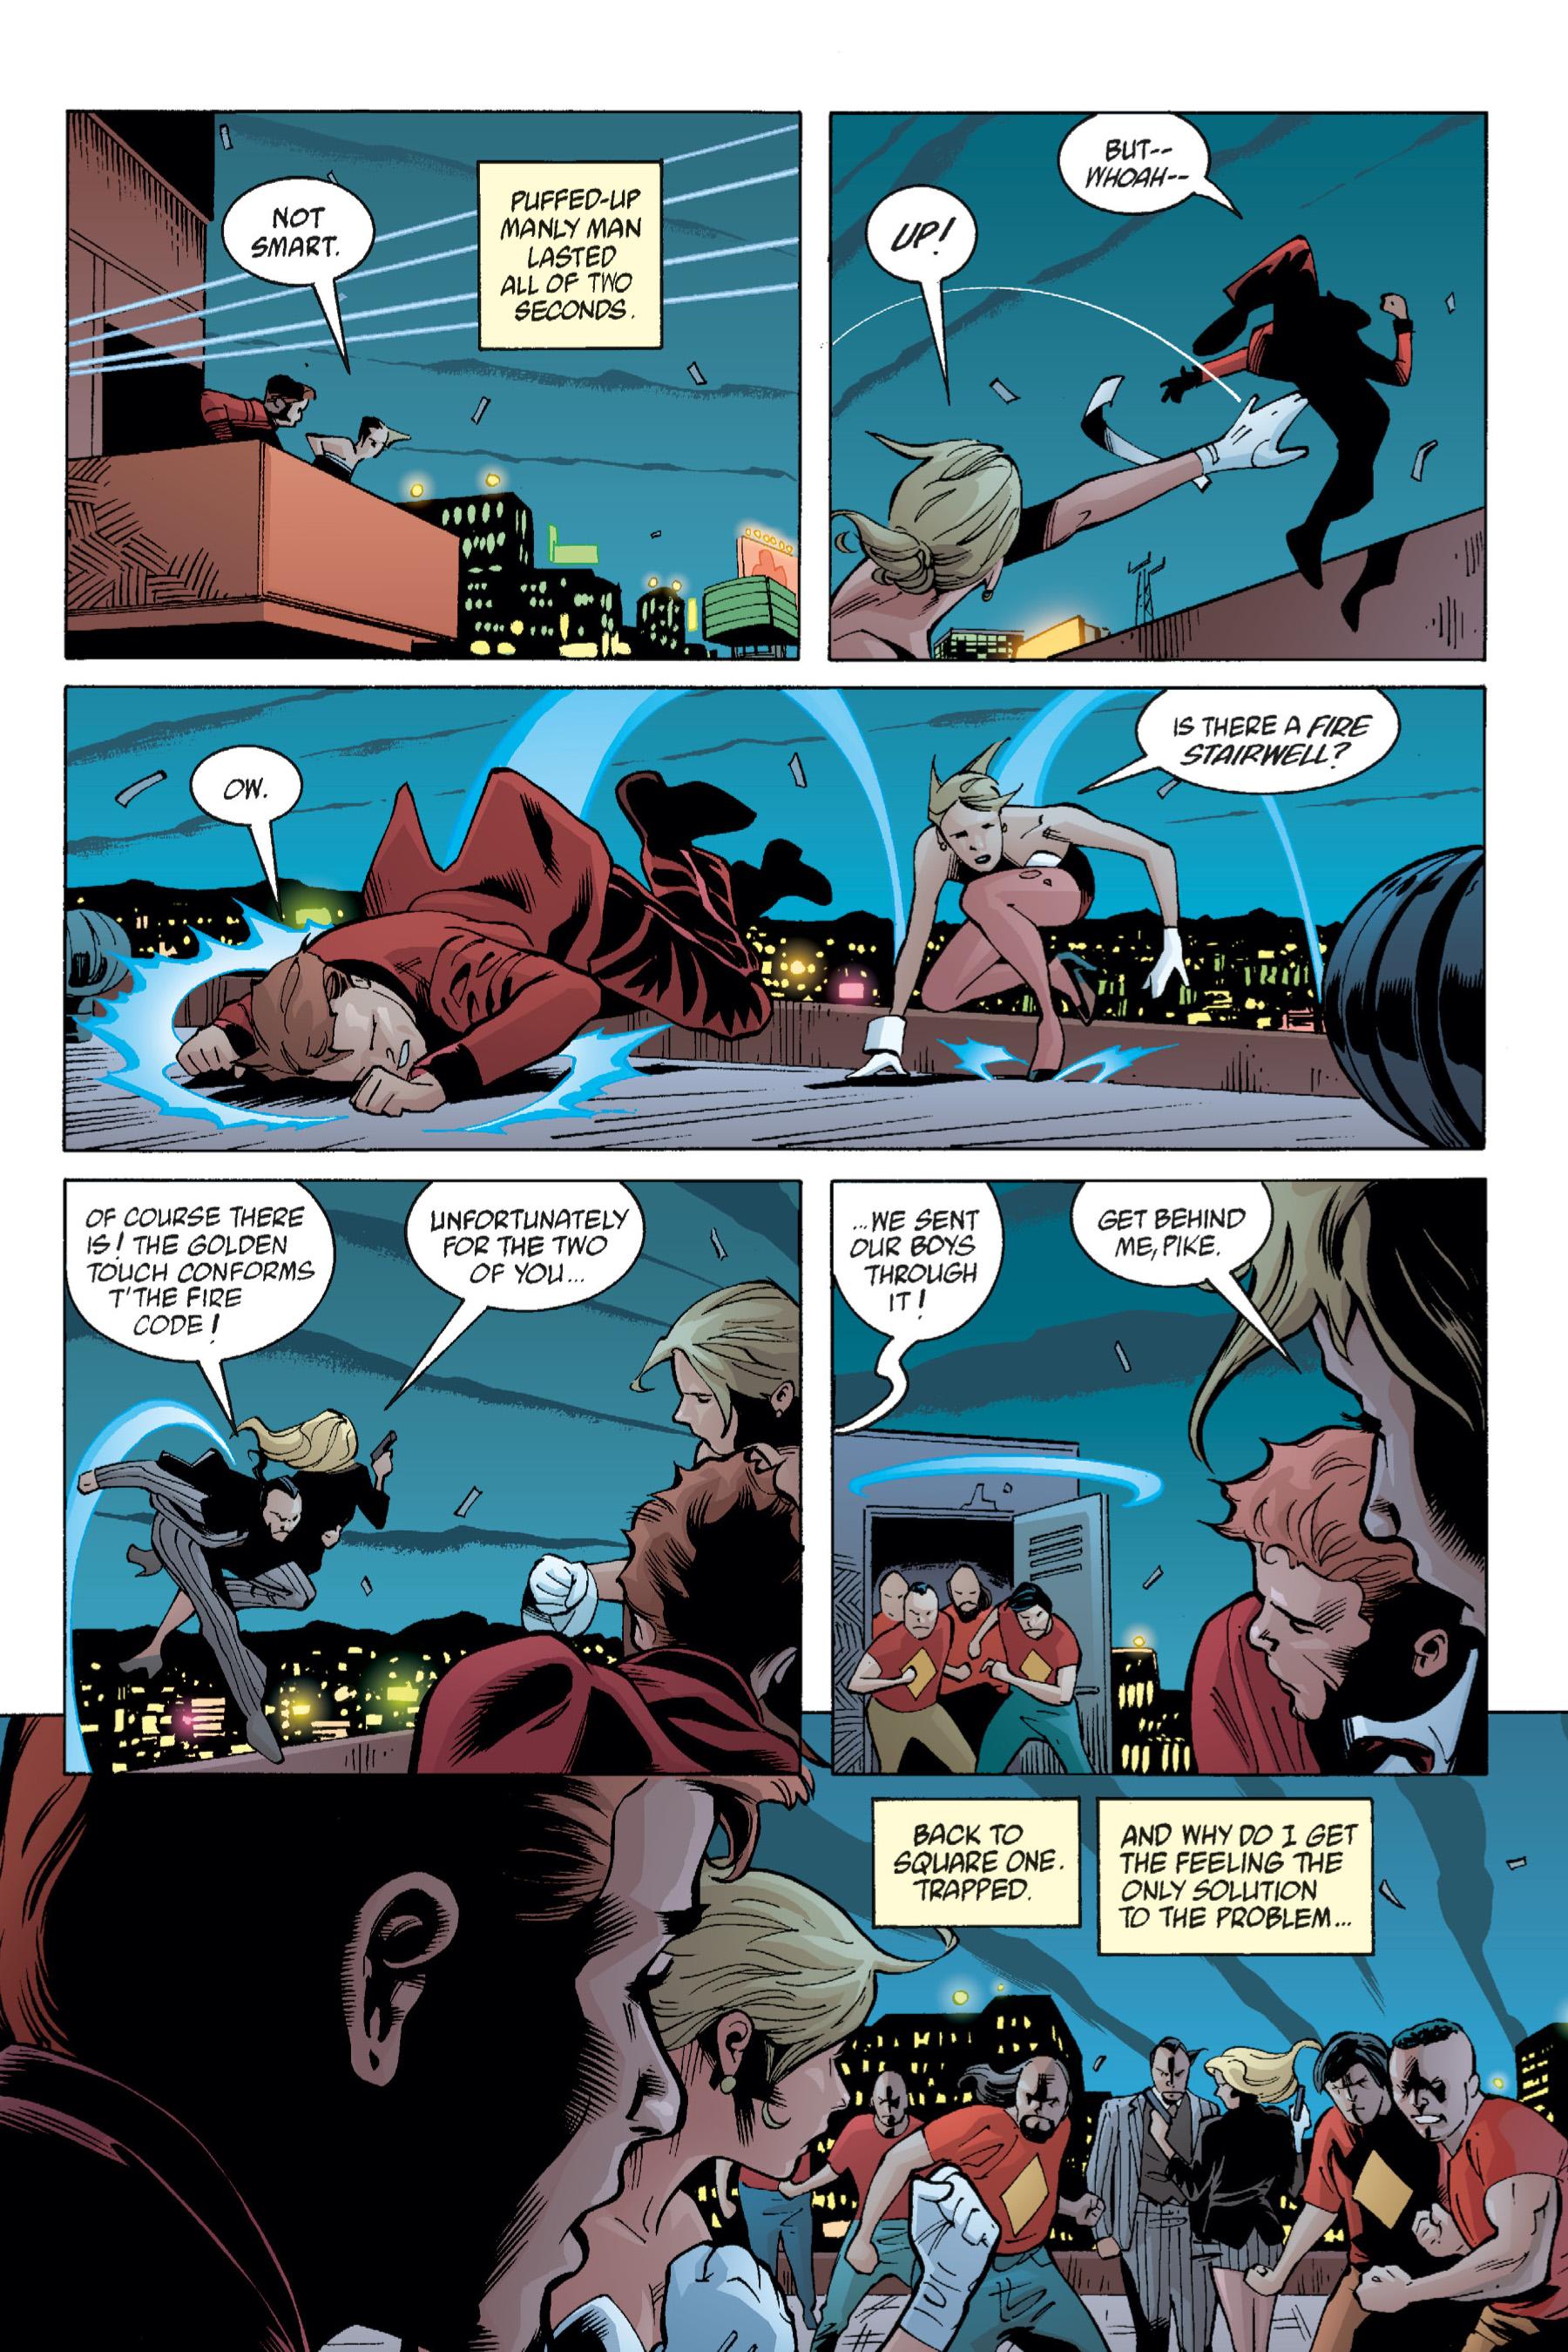 Read online Buffy the Vampire Slayer: Omnibus comic -  Issue # TPB 1 - 164